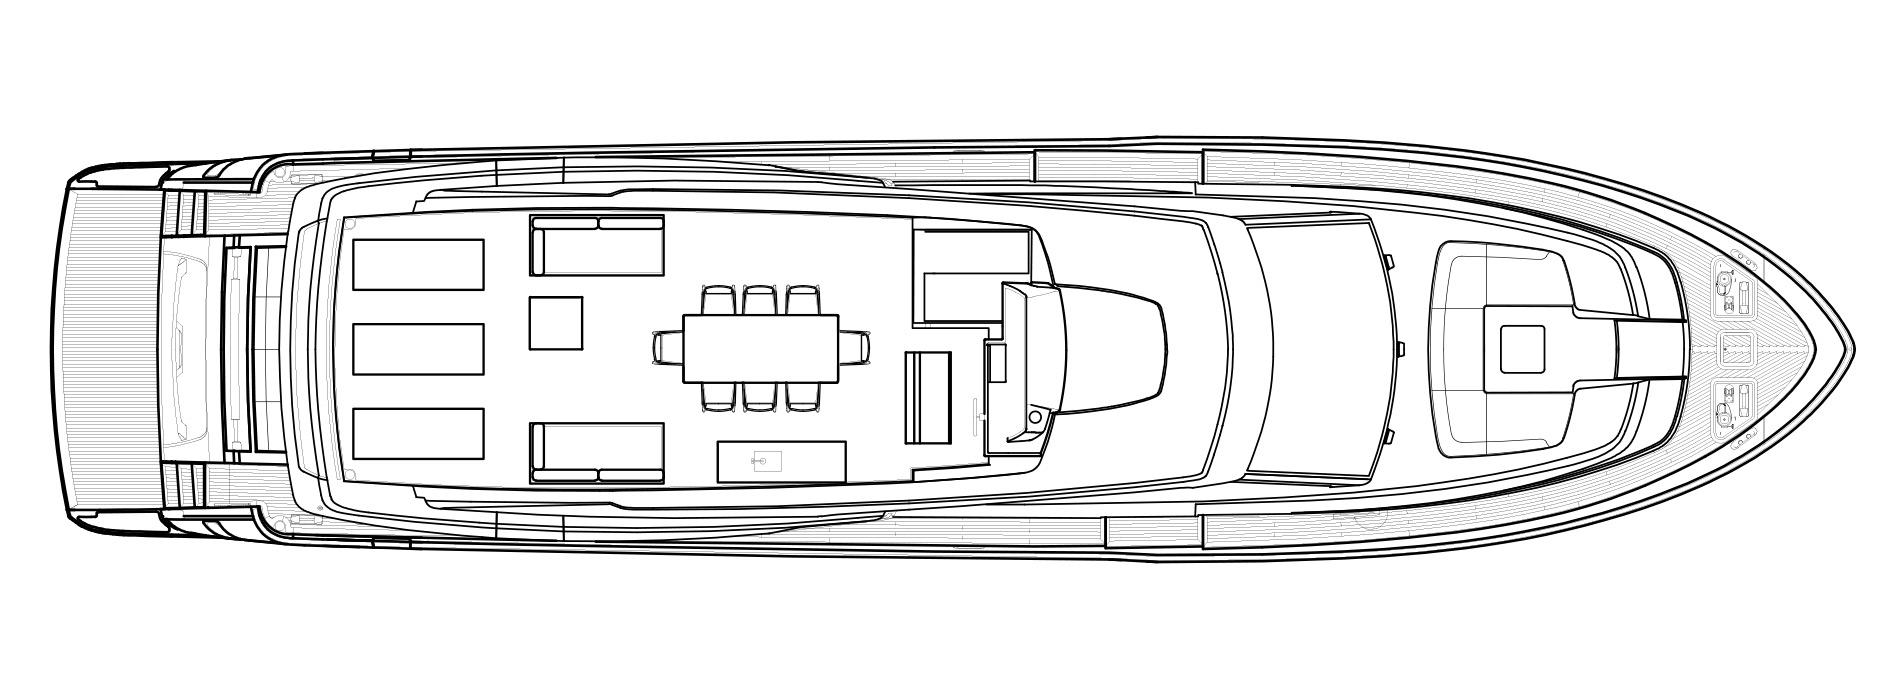 Sanlorenzo Yachts SL86/698 Флайбридж версия USA